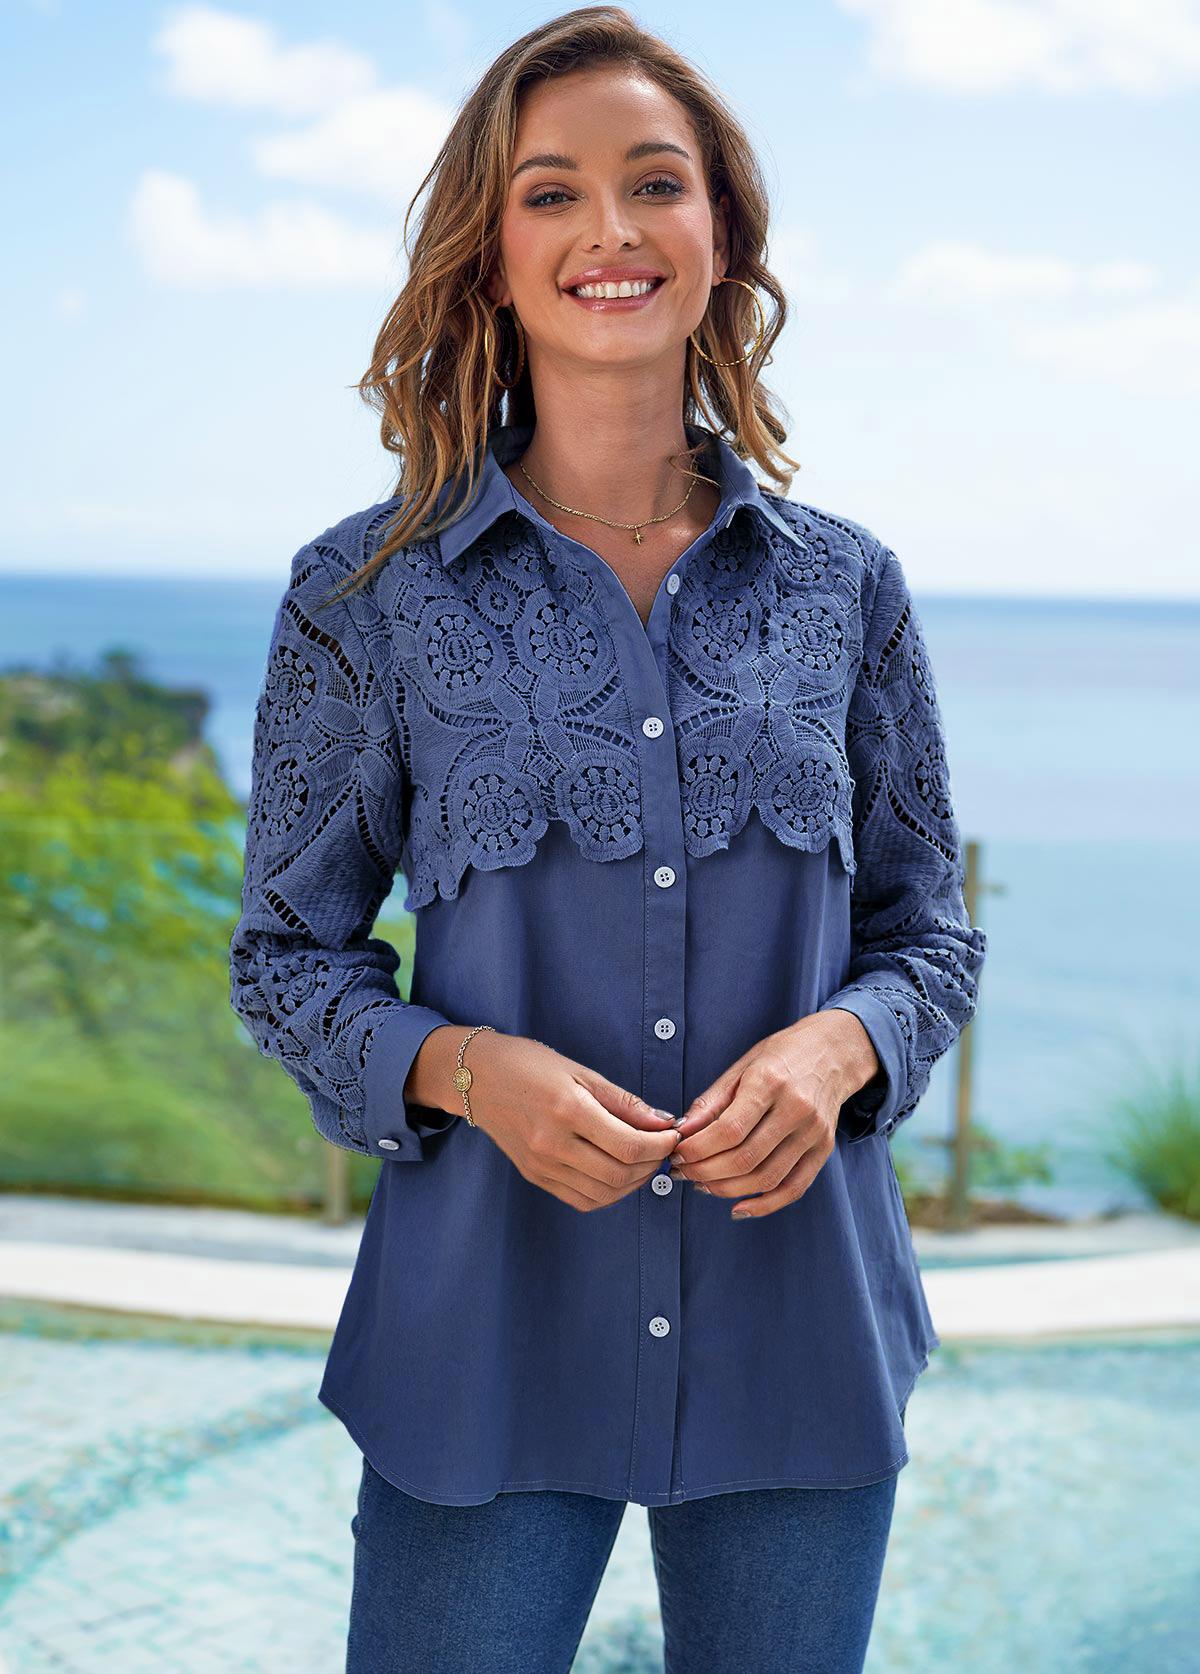 ROTITA Lace Stitching Faux Denim Turndown Collar Blouse